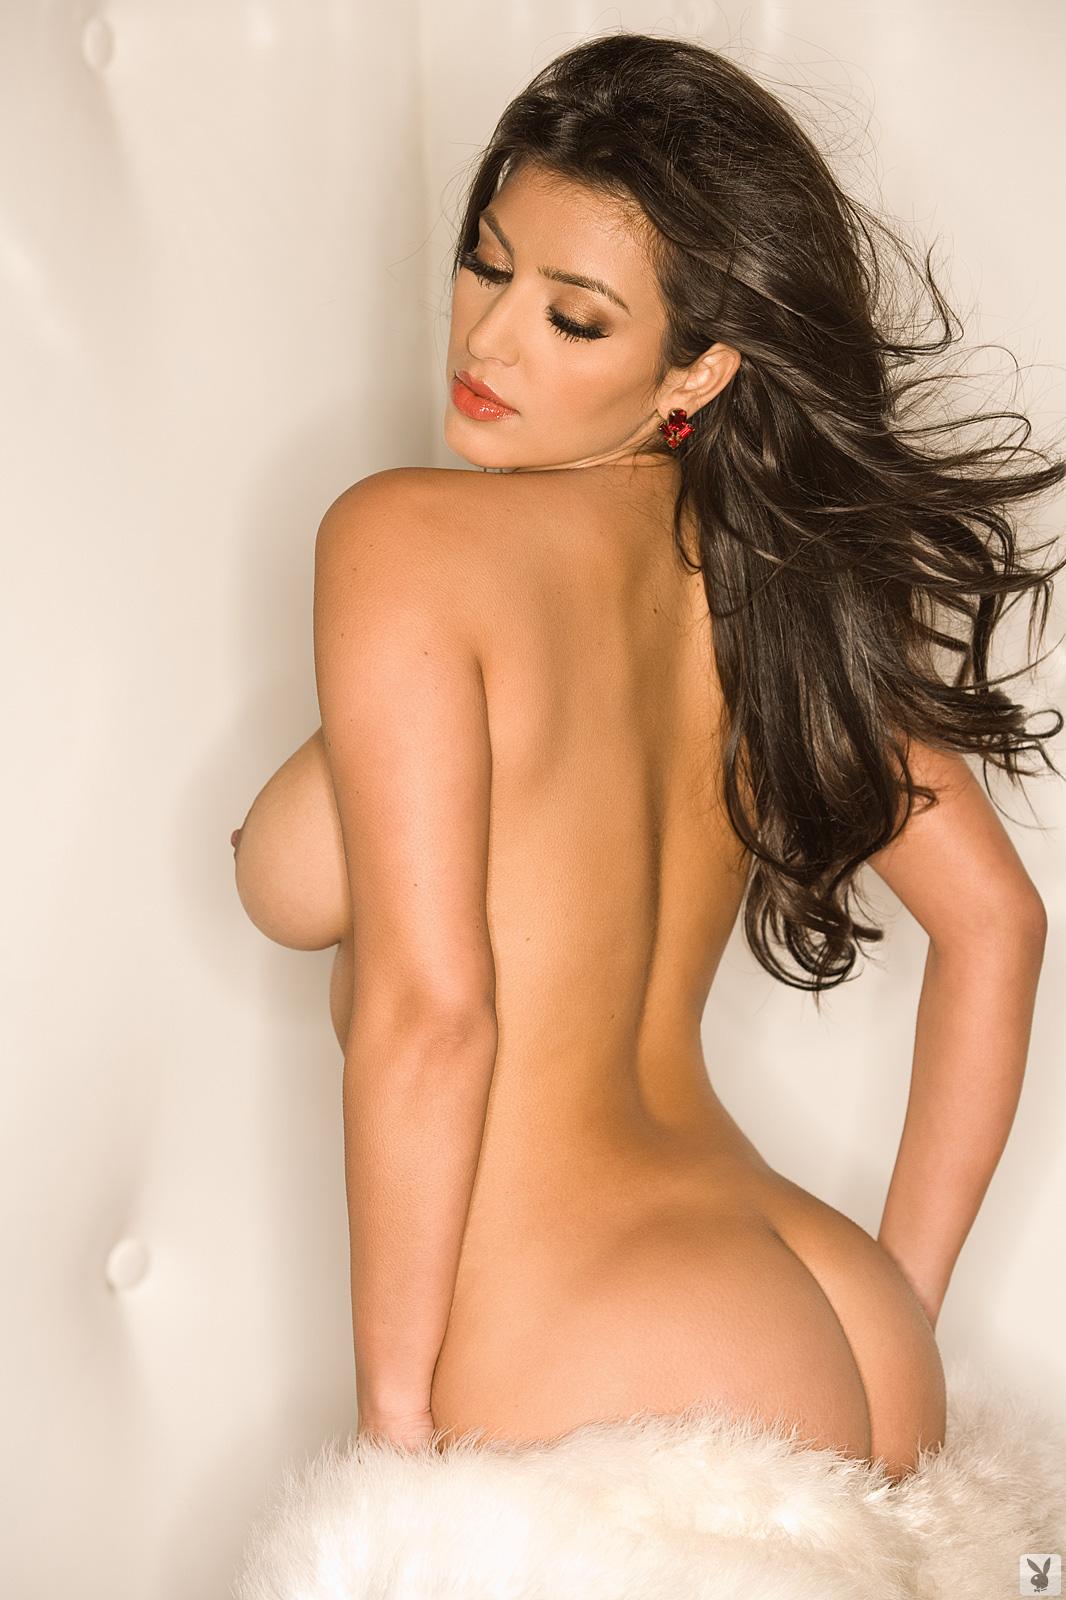 Sexiest girl